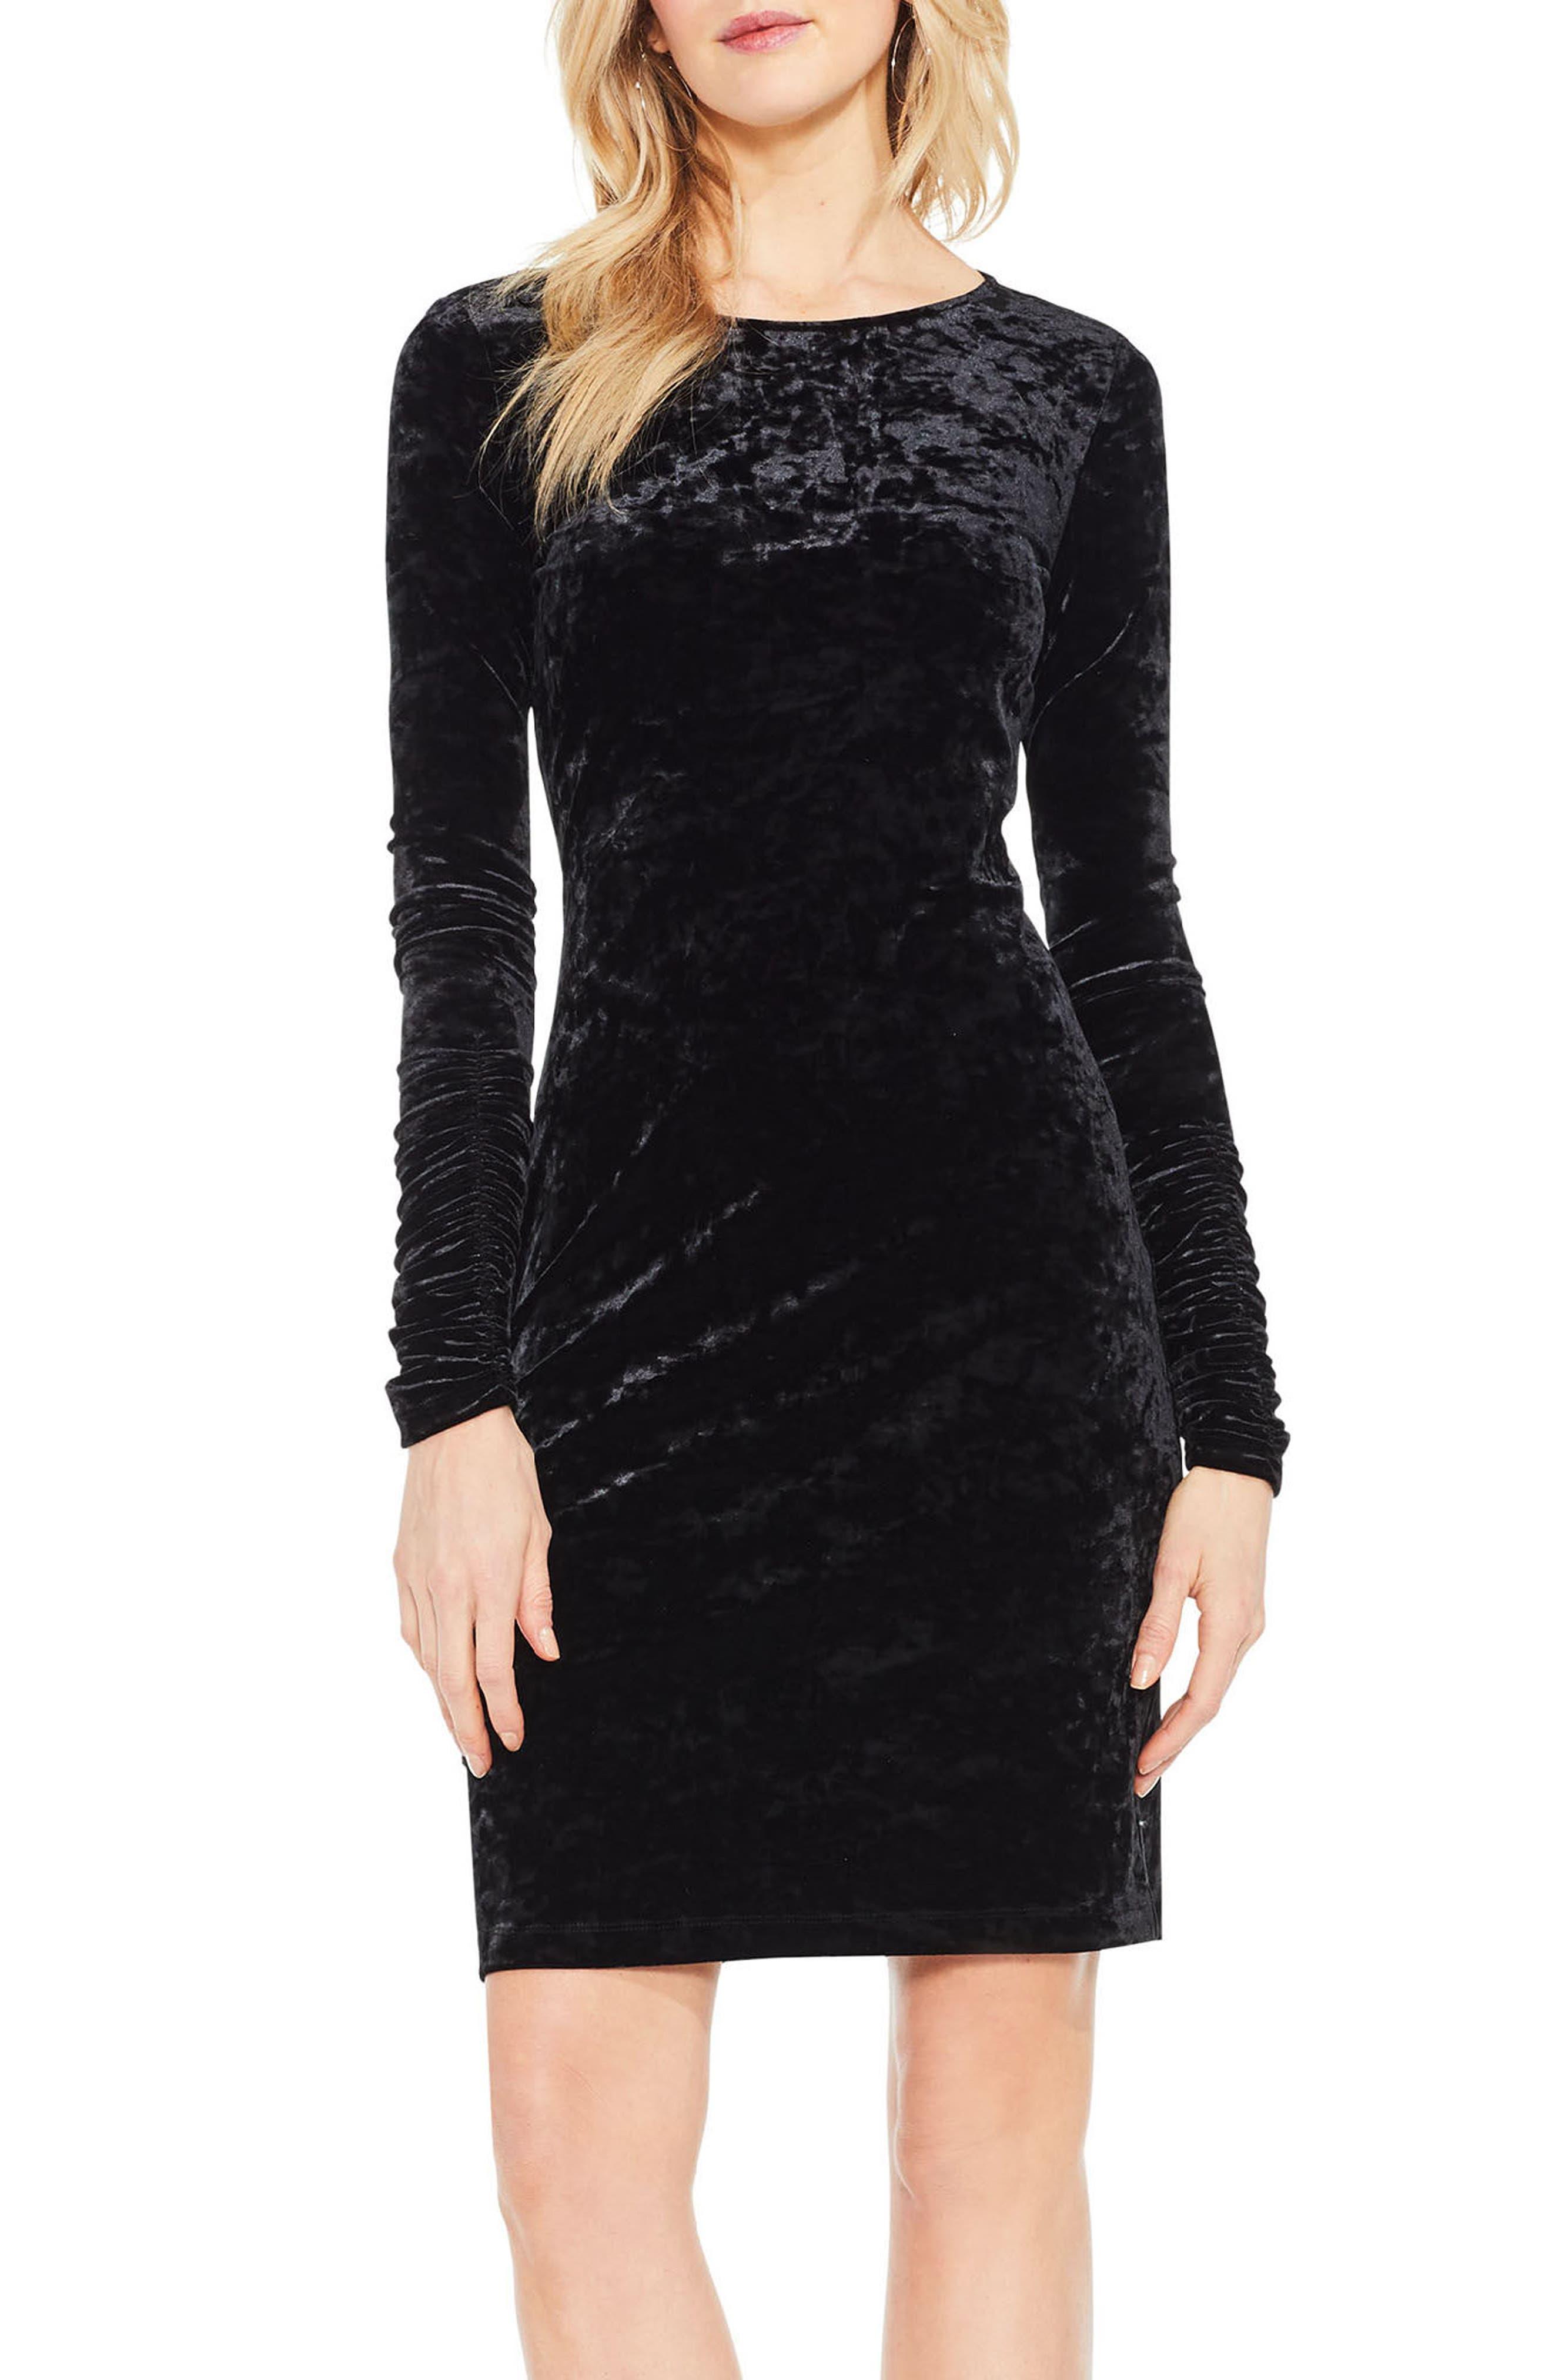 Alternate Image 1 Selected - Vince Camuto Ruched Sleeve Crushed Velvet Dress